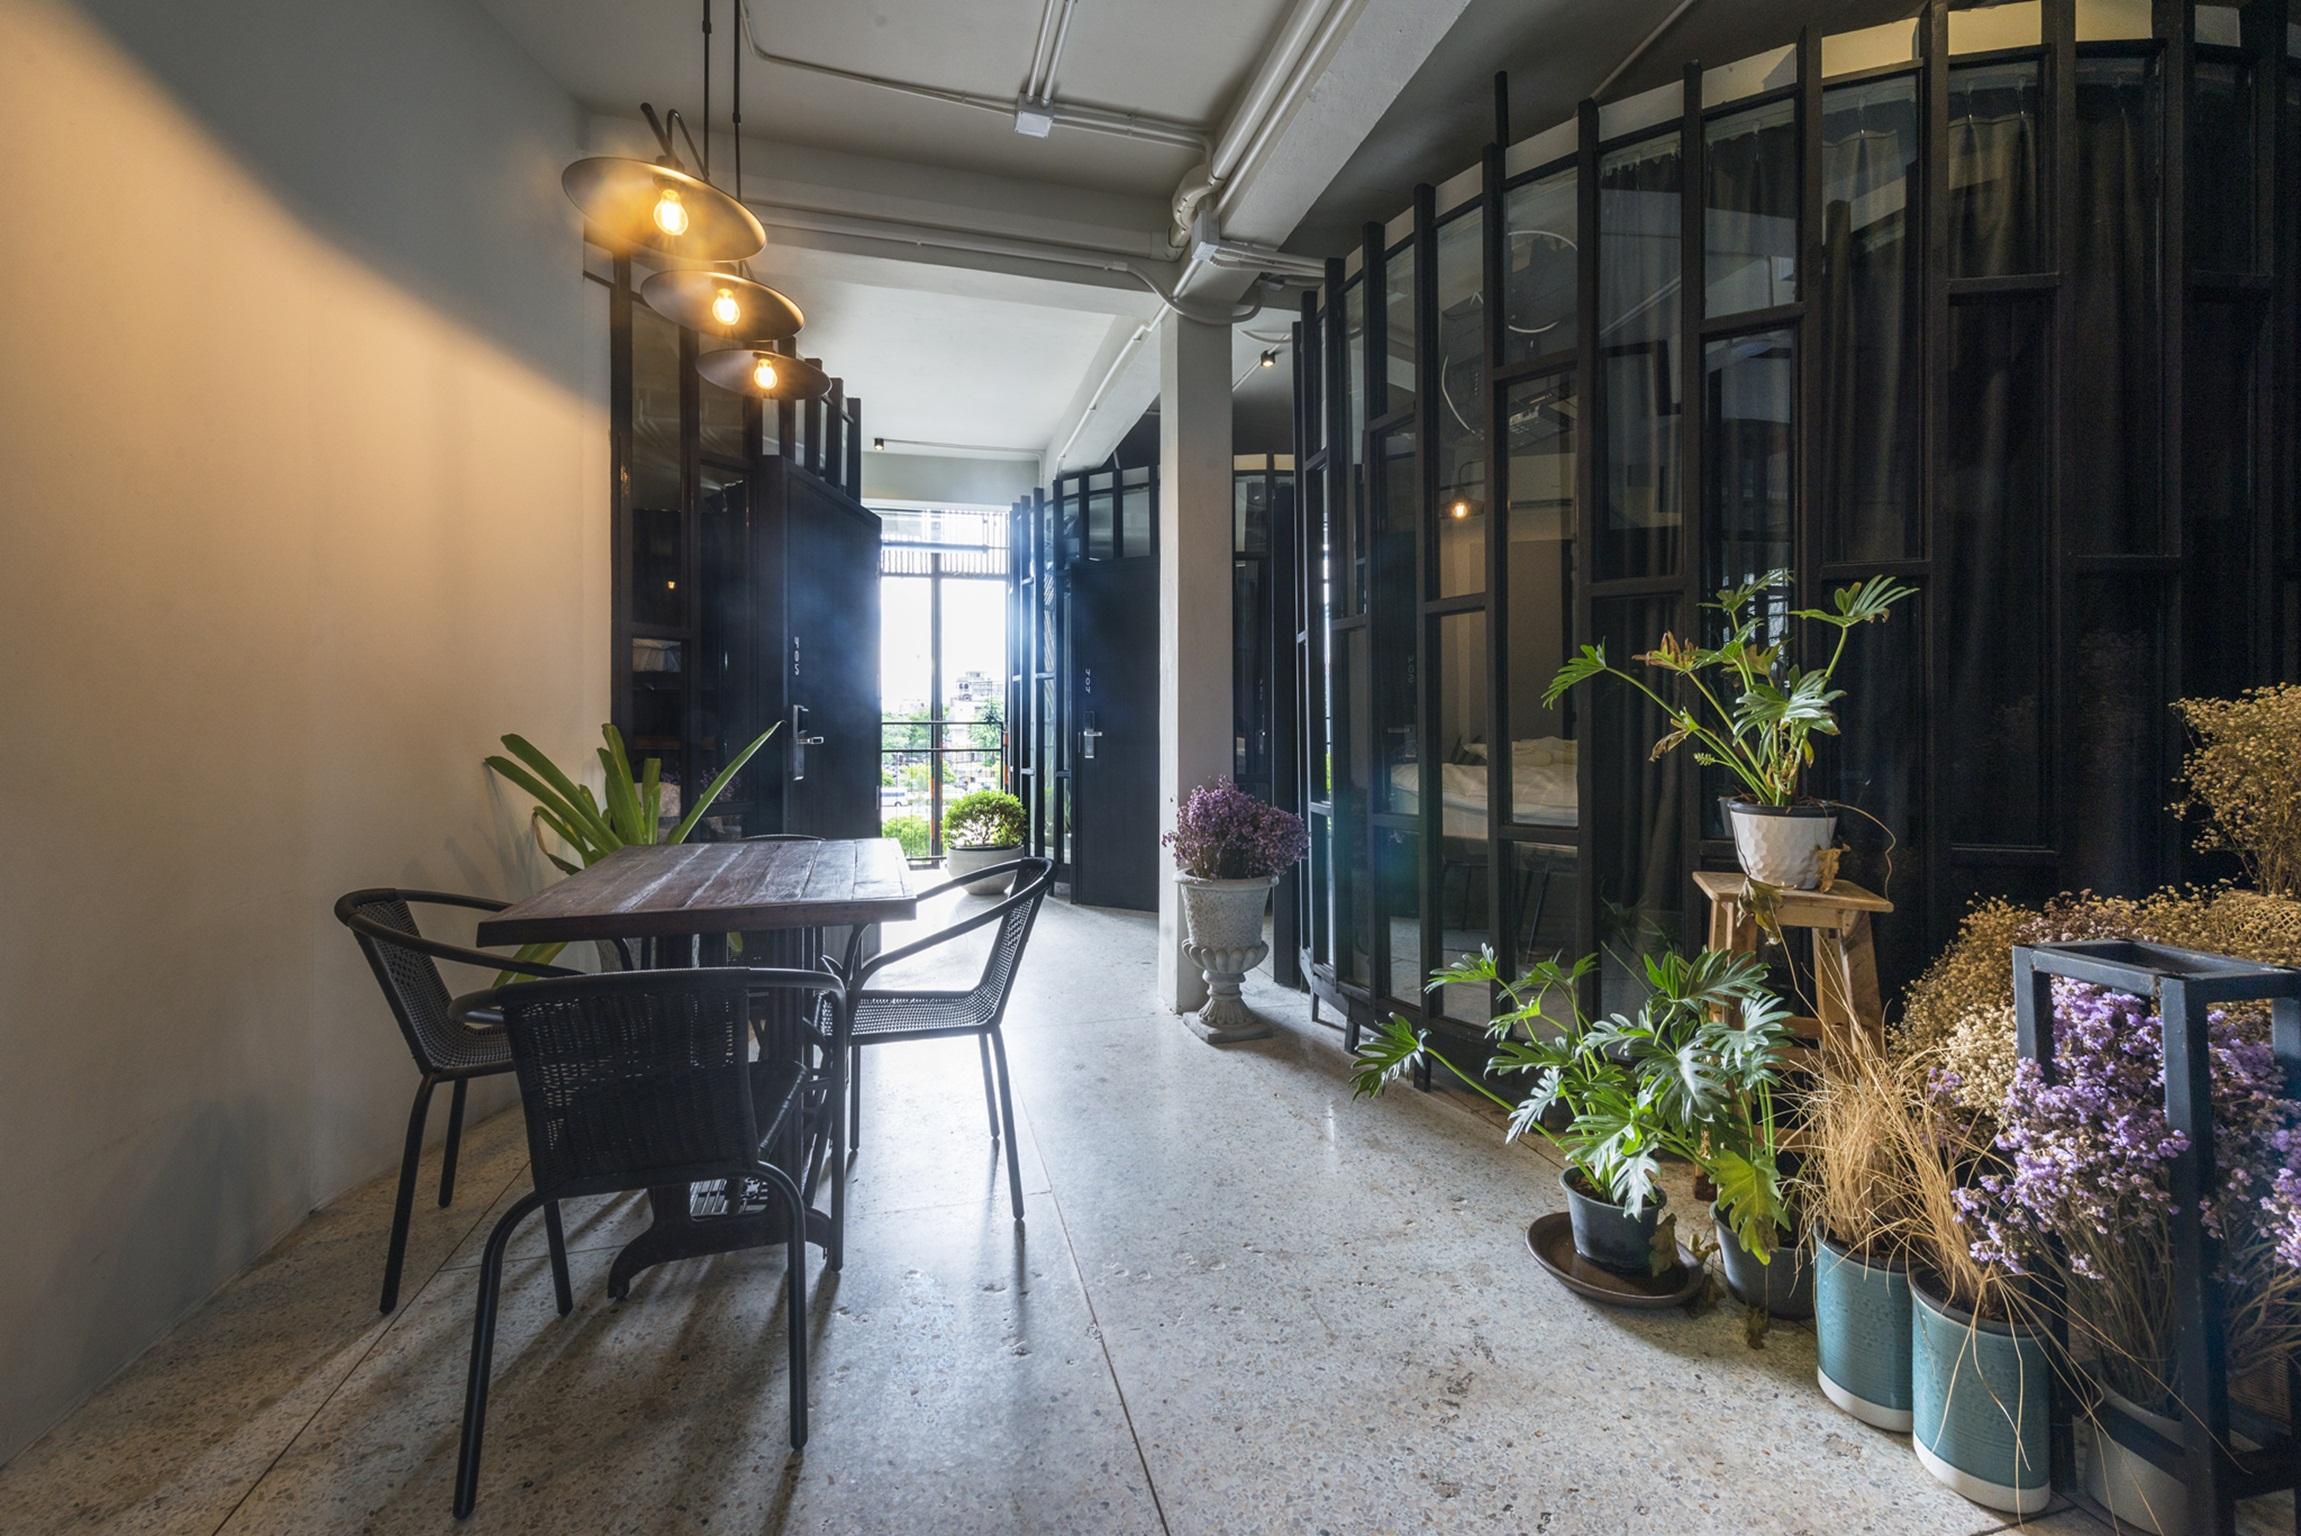 Chingcha Hostel Private_common area